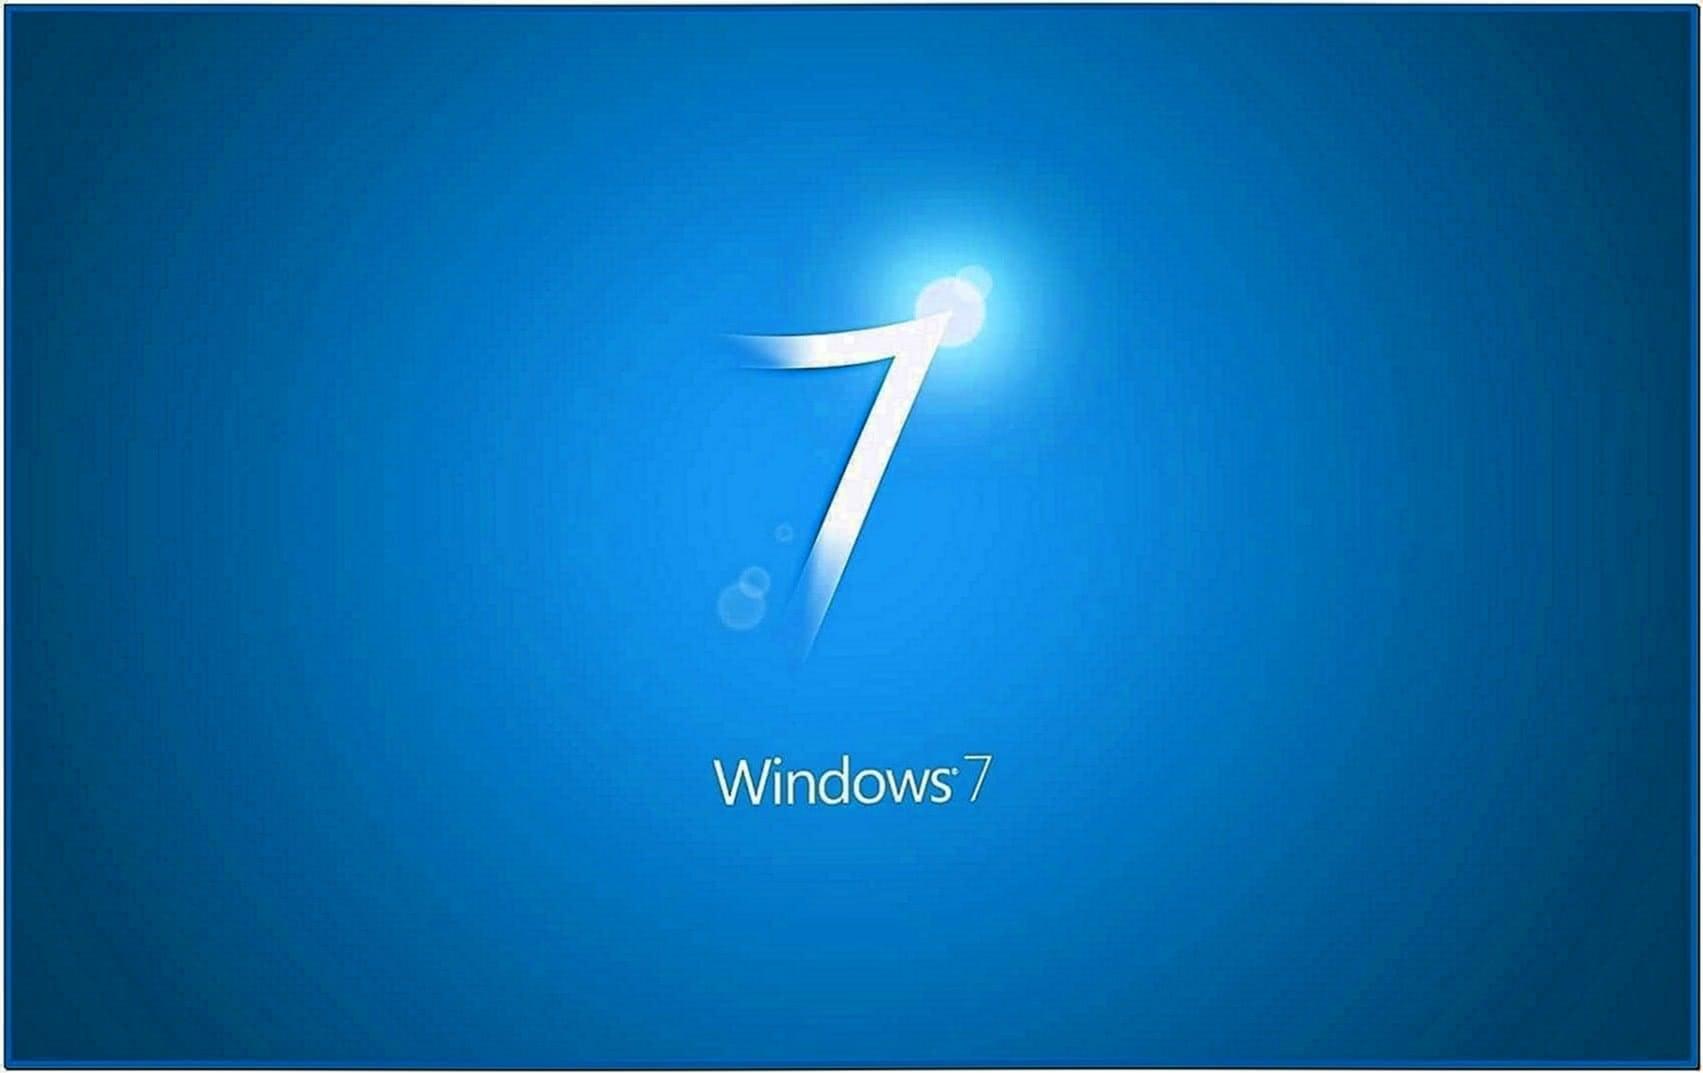 Screensaver as Desktop Background Windows 7